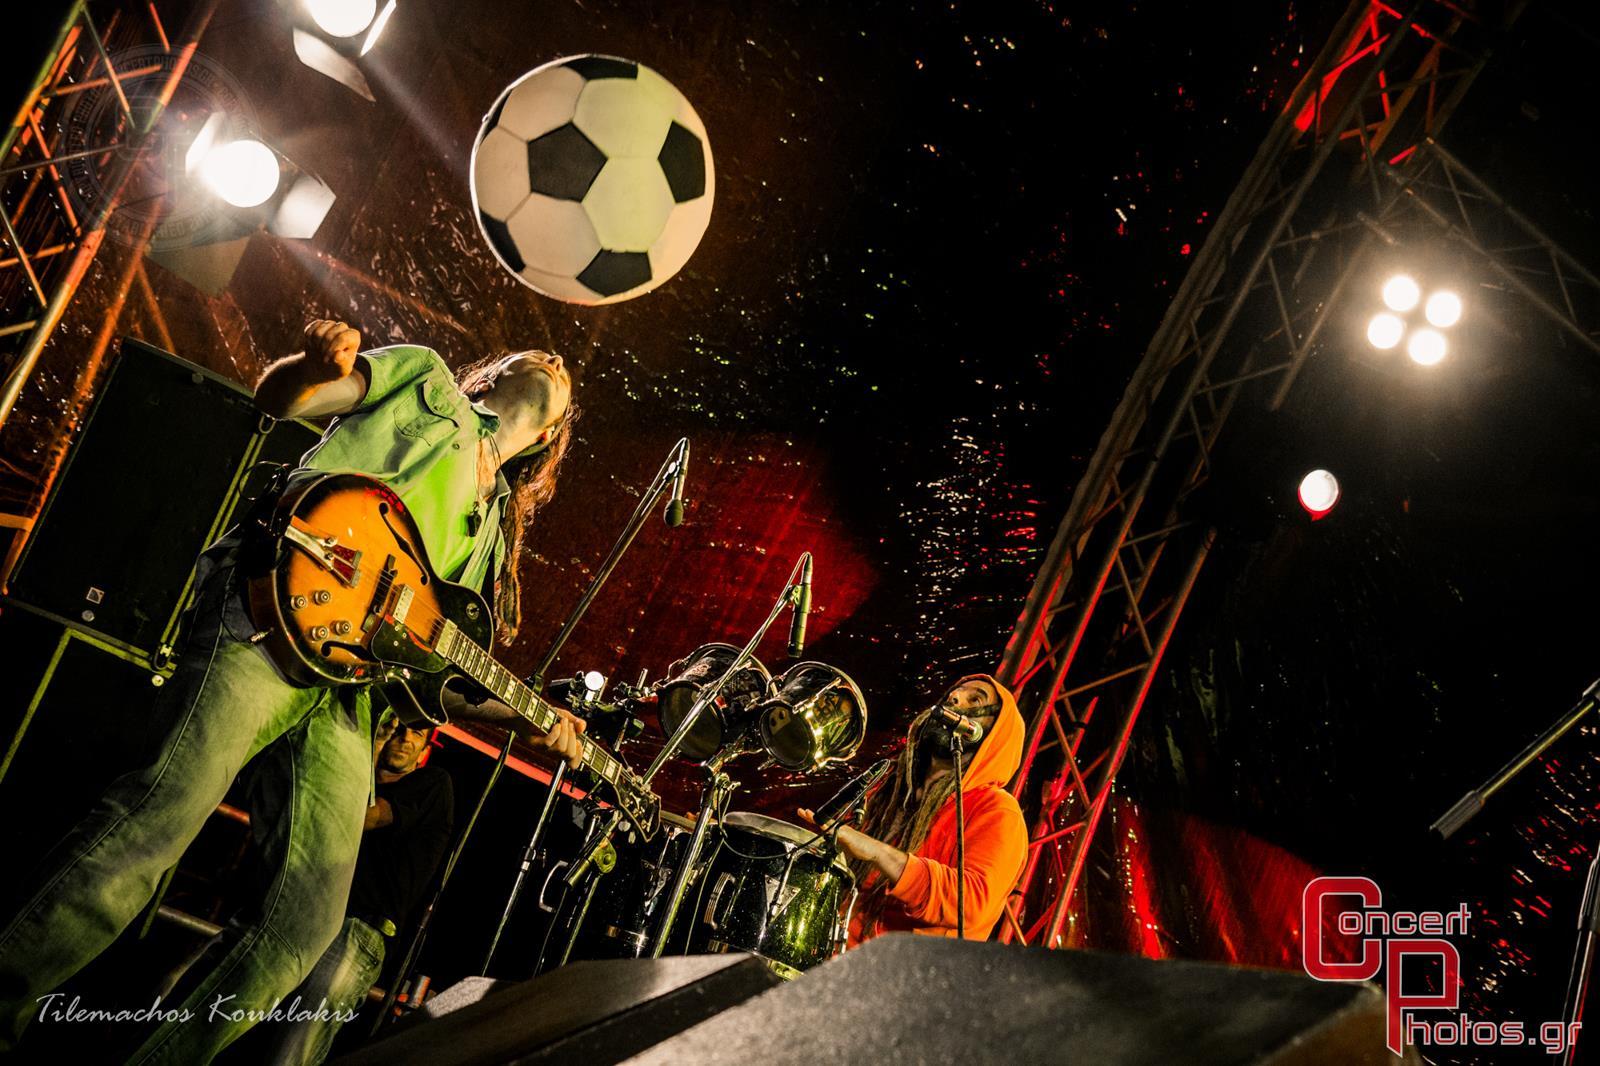 Locomondo & The Jaguar Bombs-Locomondo The Jaguar Bombs photographer:  - concertphotos_20140905_22_03_12